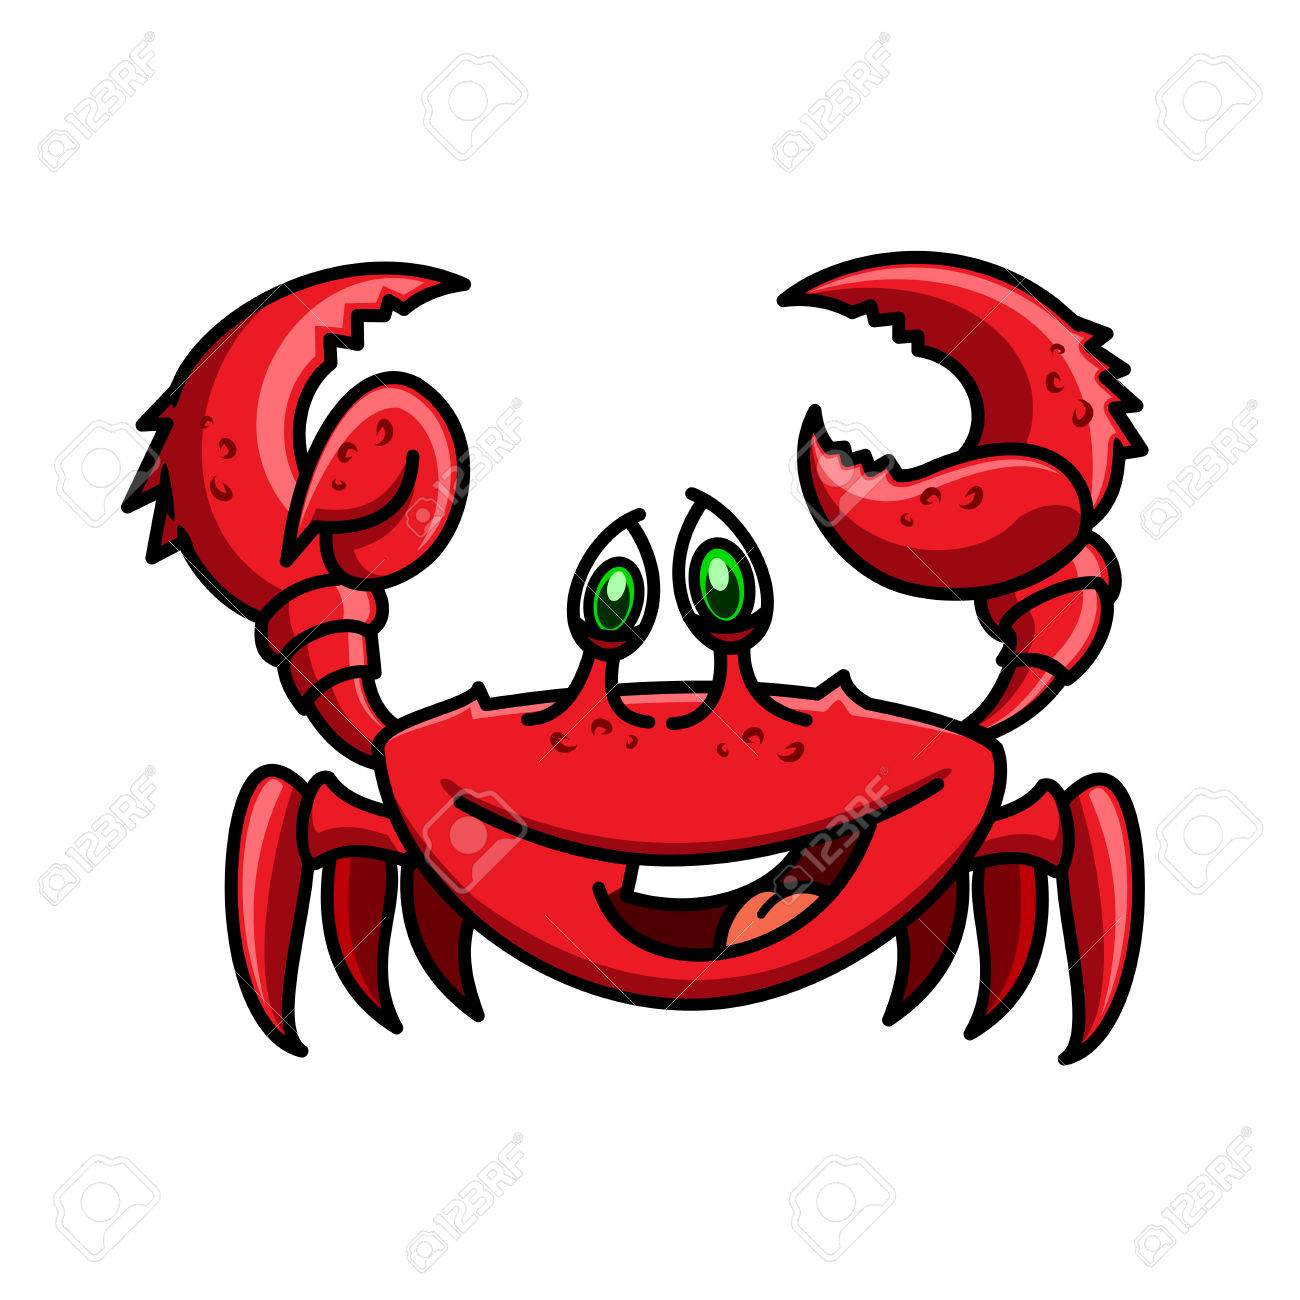 horseshoe crab clipart at getdrawings com free for personal use rh getdrawings com clip art crane clipart crayons